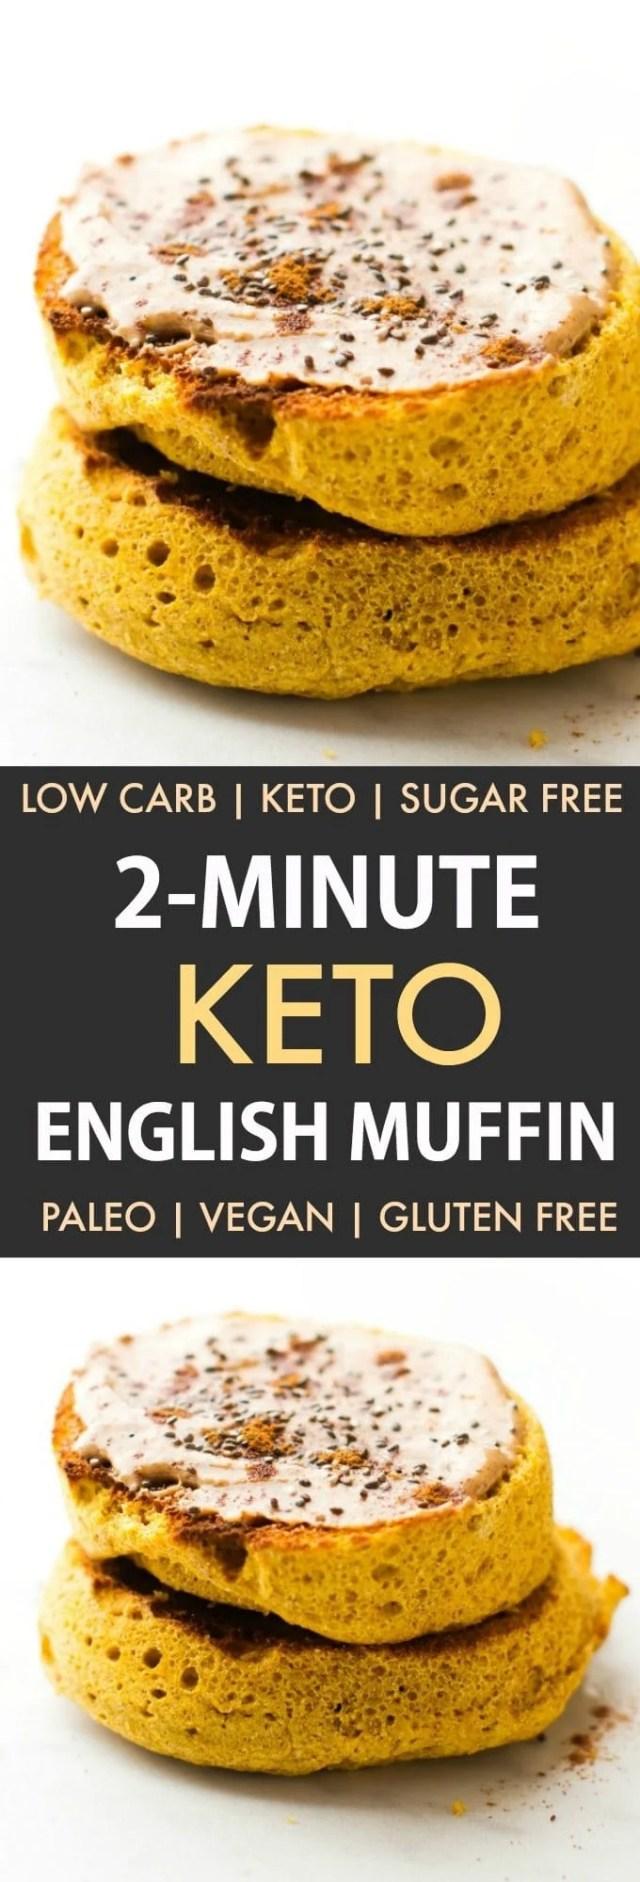 2-Minute Keto English Muffin (Paleo, Low Carb, Vegan, Gluten Free)- An easy recipe for a 2-minute flourless English muffin recipe- Super low carb and no grains or eggs needed- Oven option included! #keto #mugmuffin #ketobread #paleobread | Recipe on thebigmansworld.com